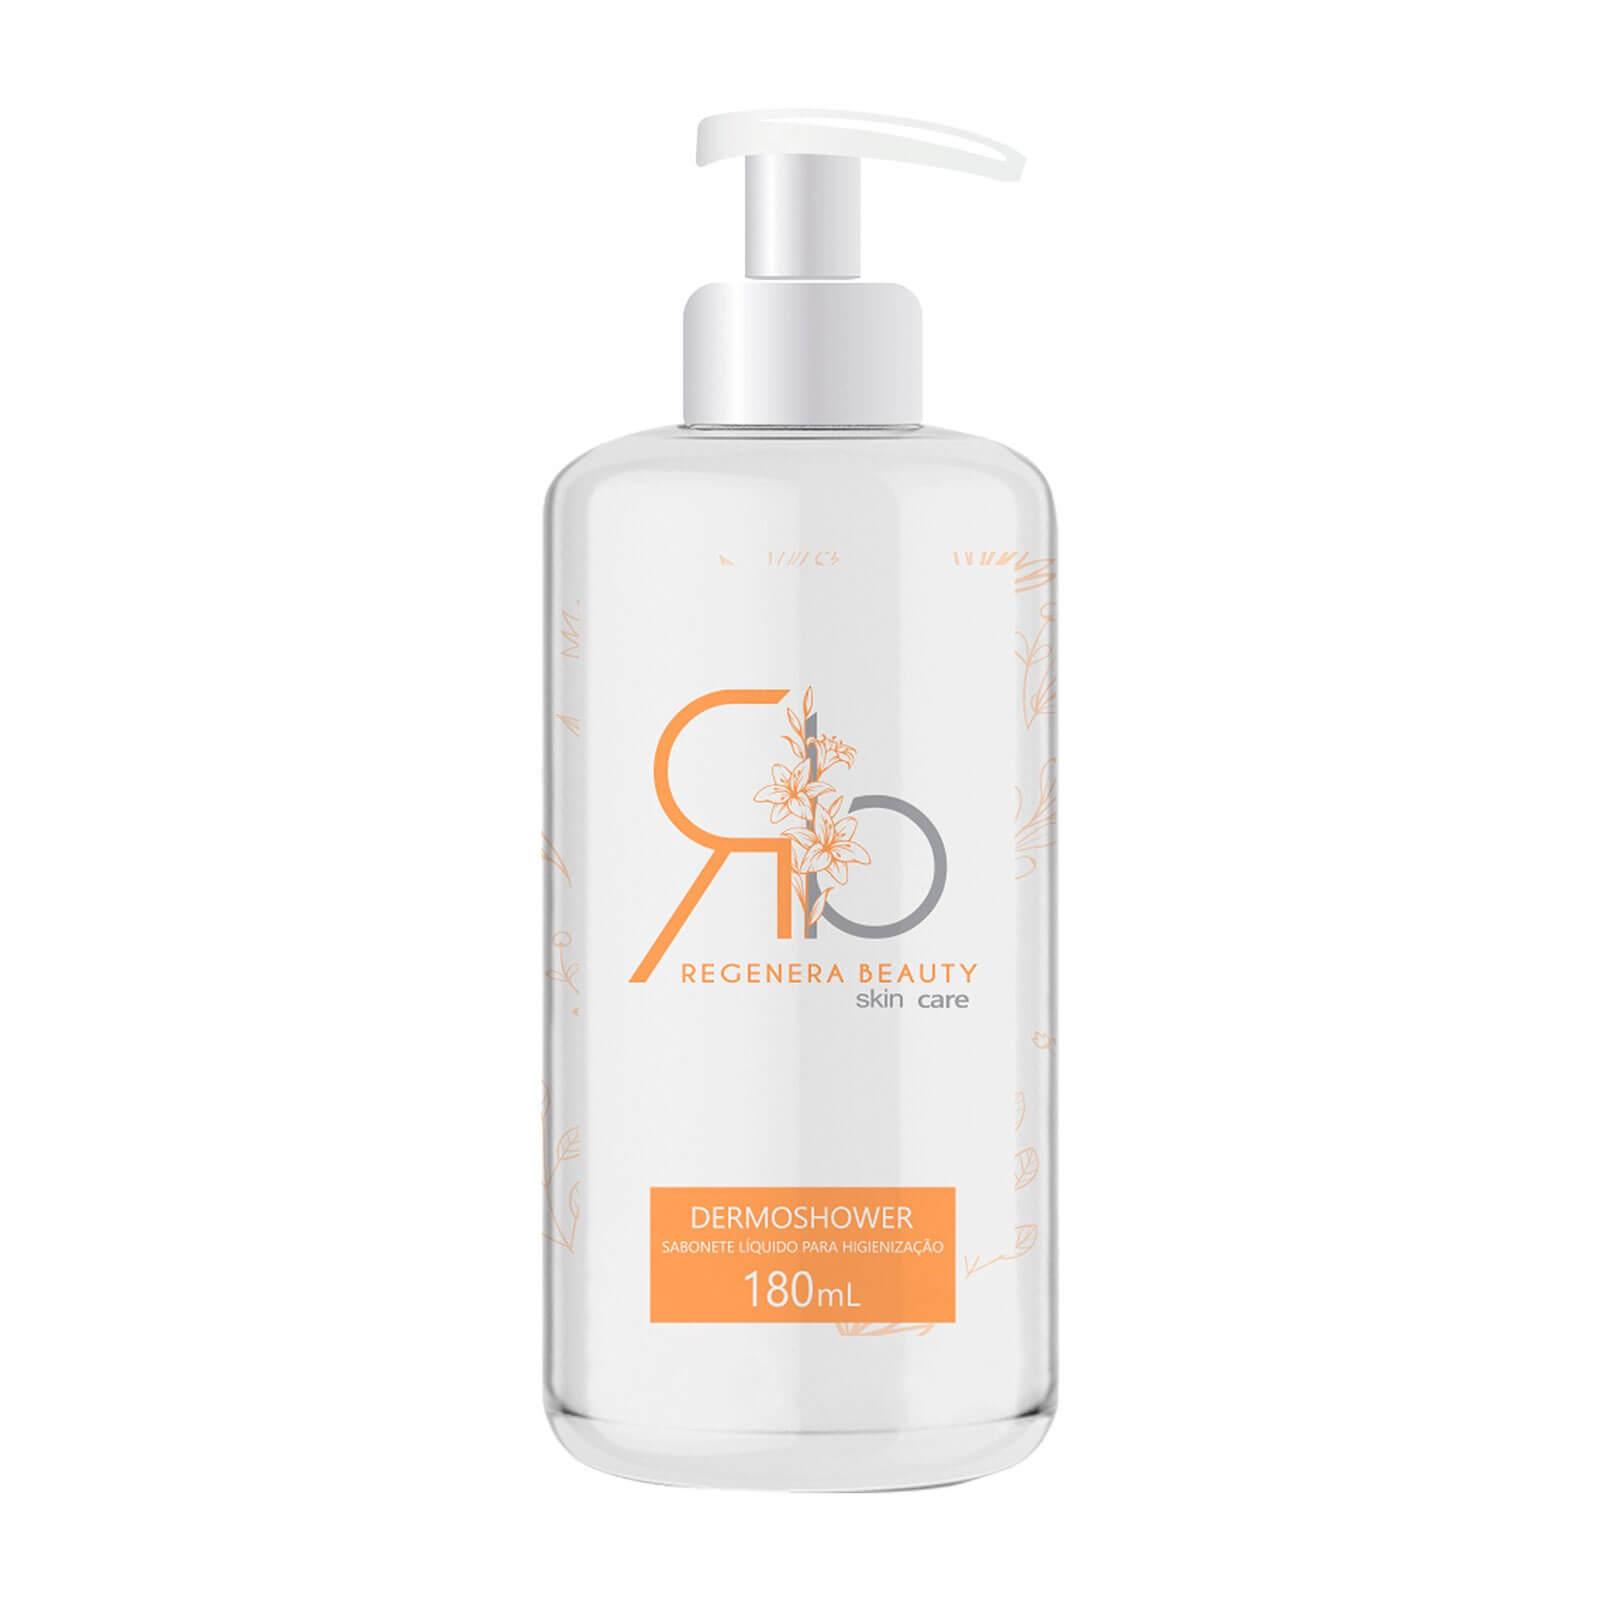 Sabonete Líquido Higienização Regenera Beauty Dermoshower 180ml